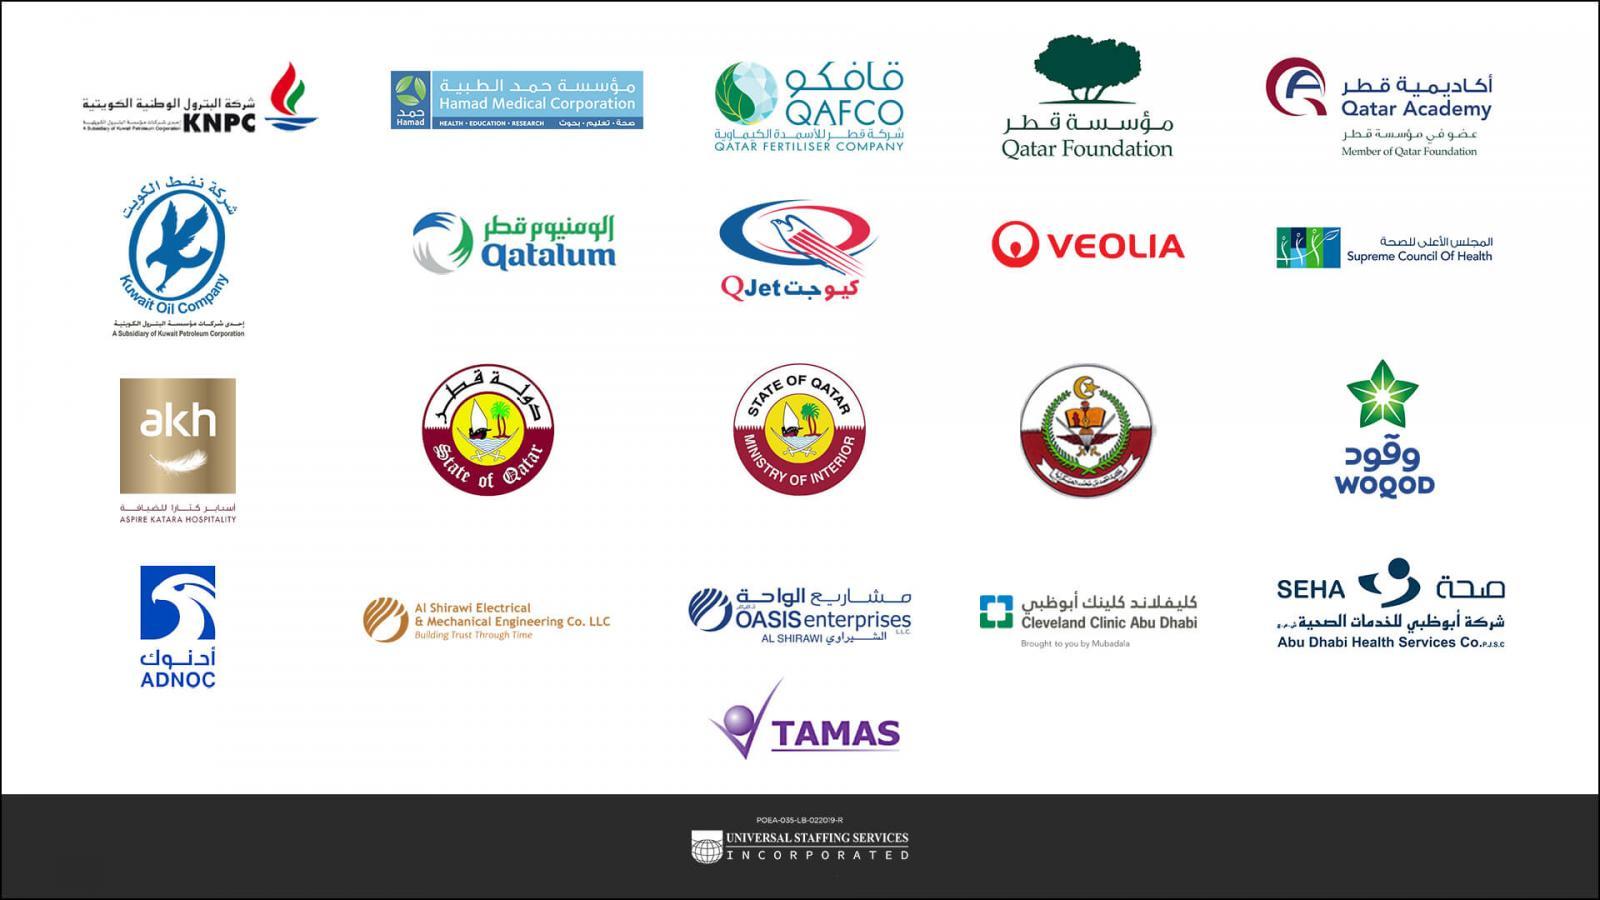 Unistaff client partners logos